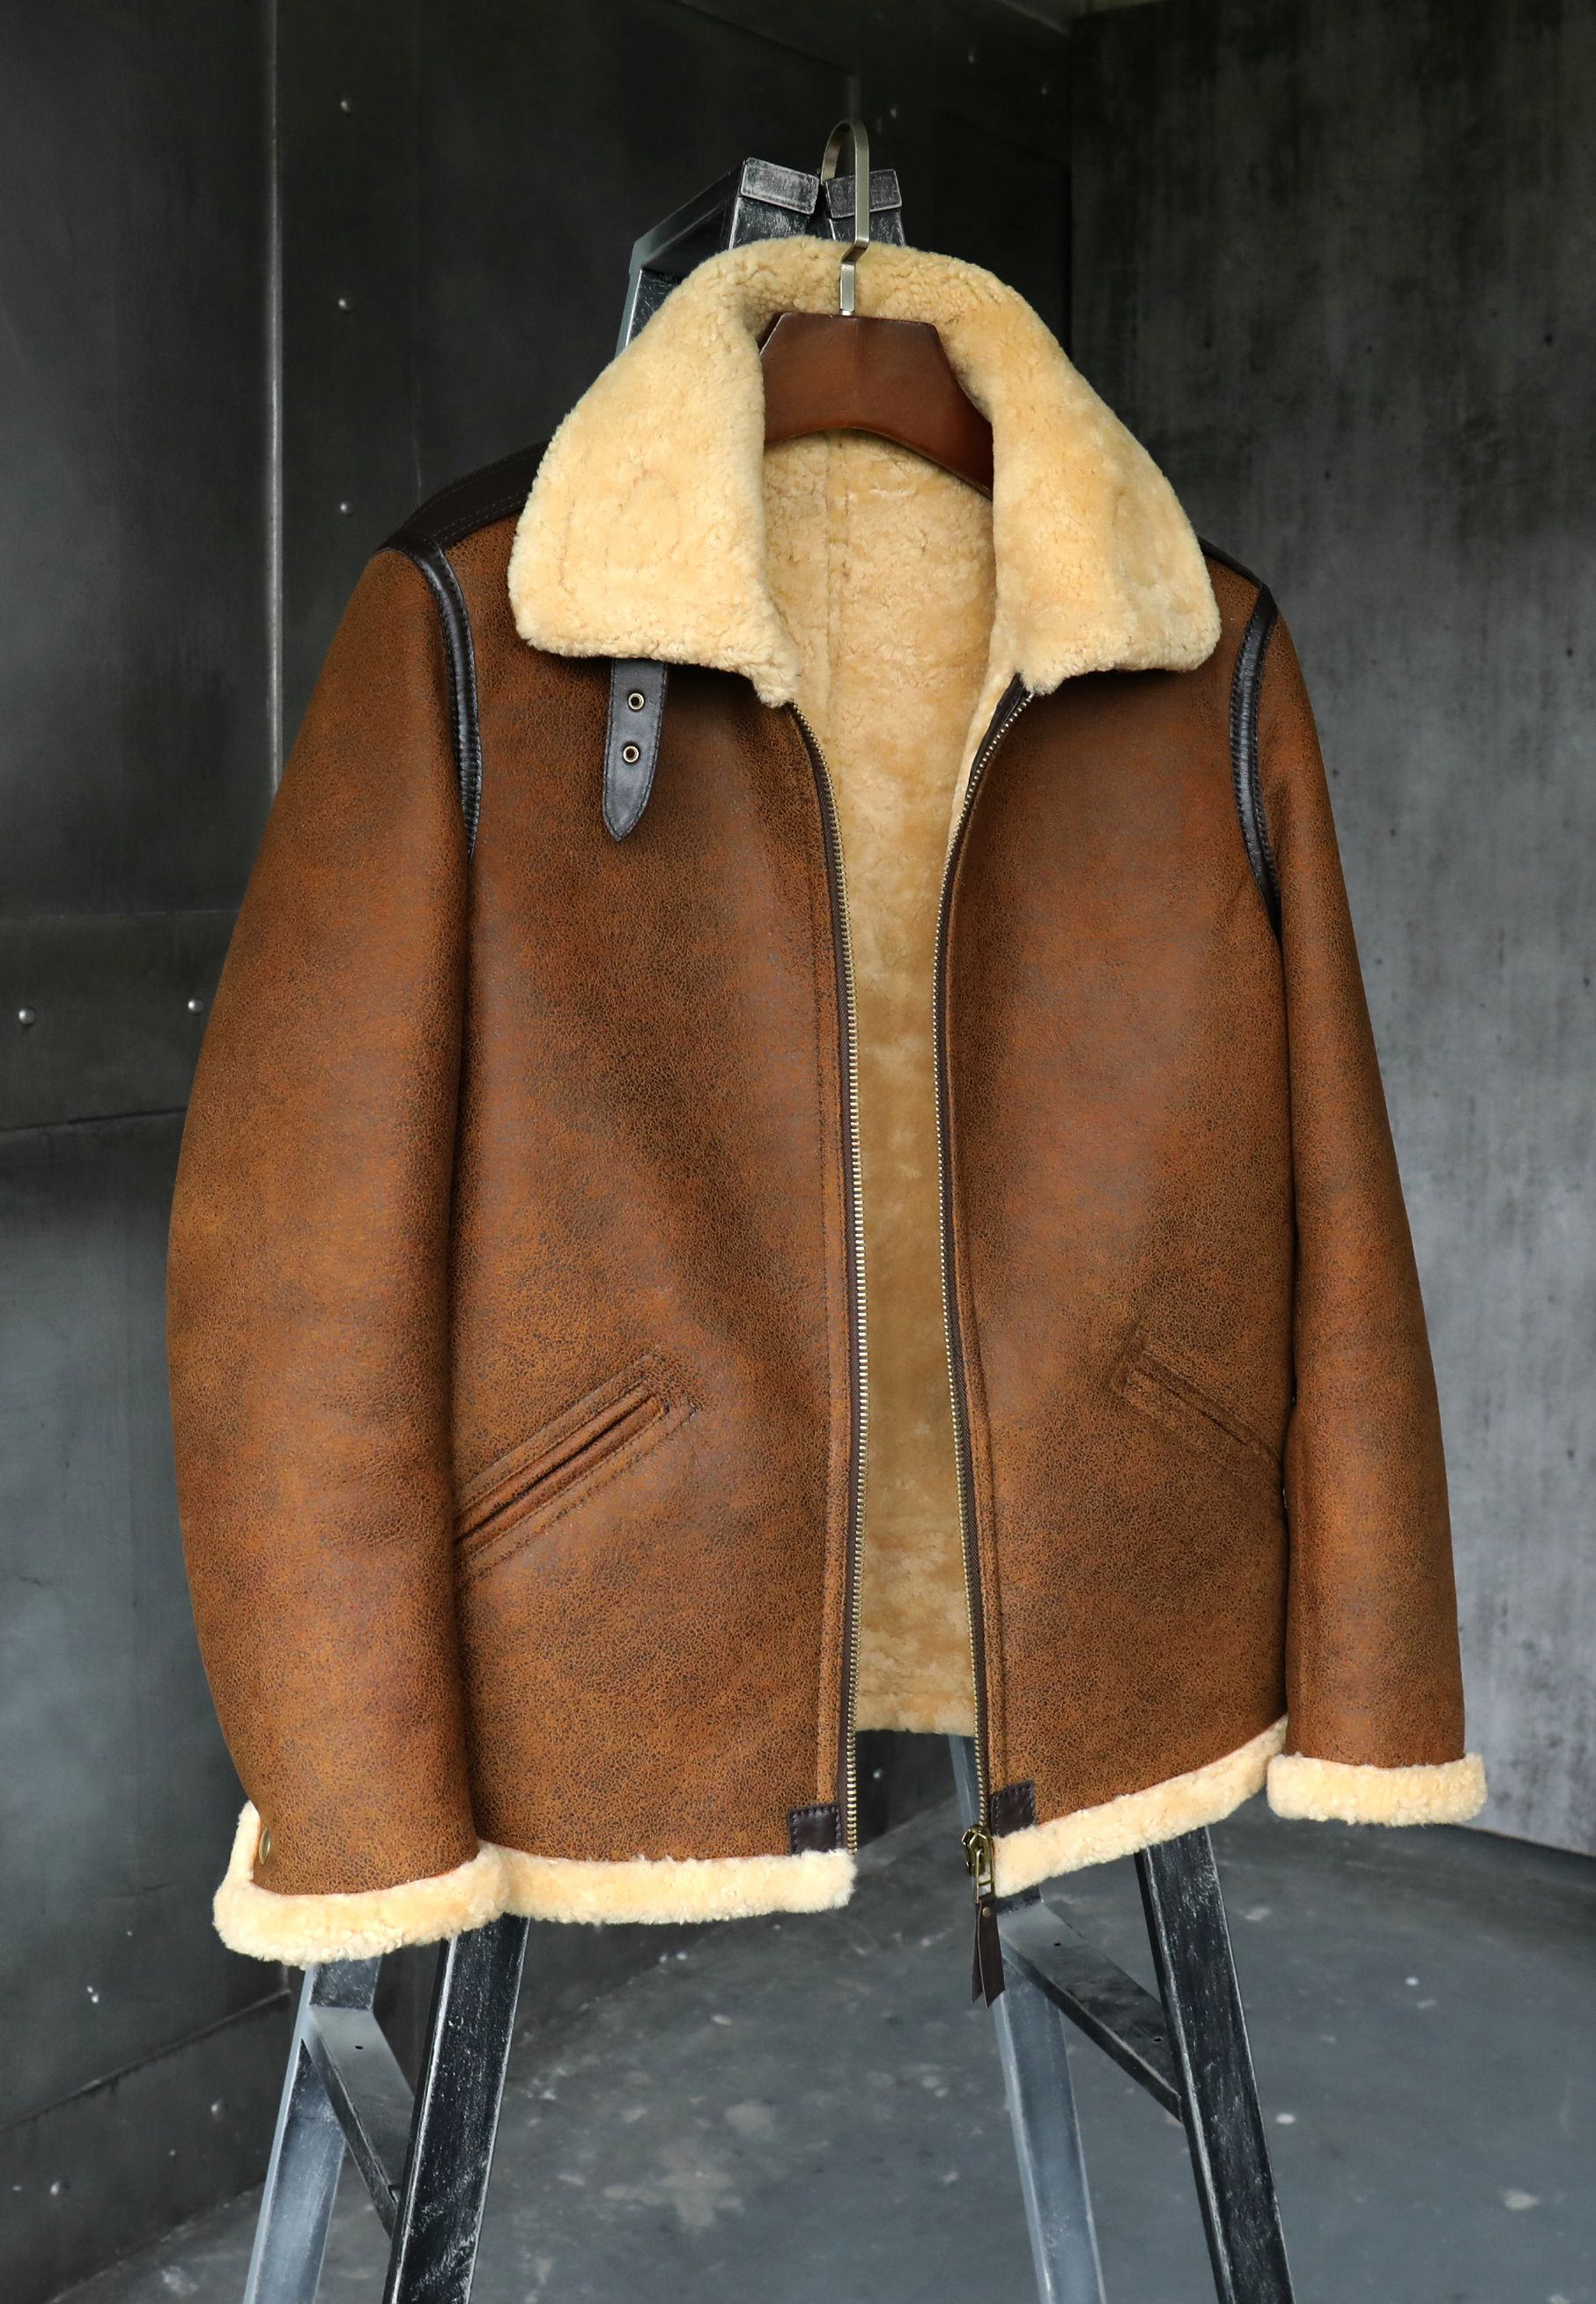 B3 Men S Shearling Jacket Flight Jacket Short Fur Leather Jacket Imported Wool From Australia Mens Shearling Jacket Mens Leather Bomber Jacket Shearling Jacket [ 2616 x 1812 Pixel ]